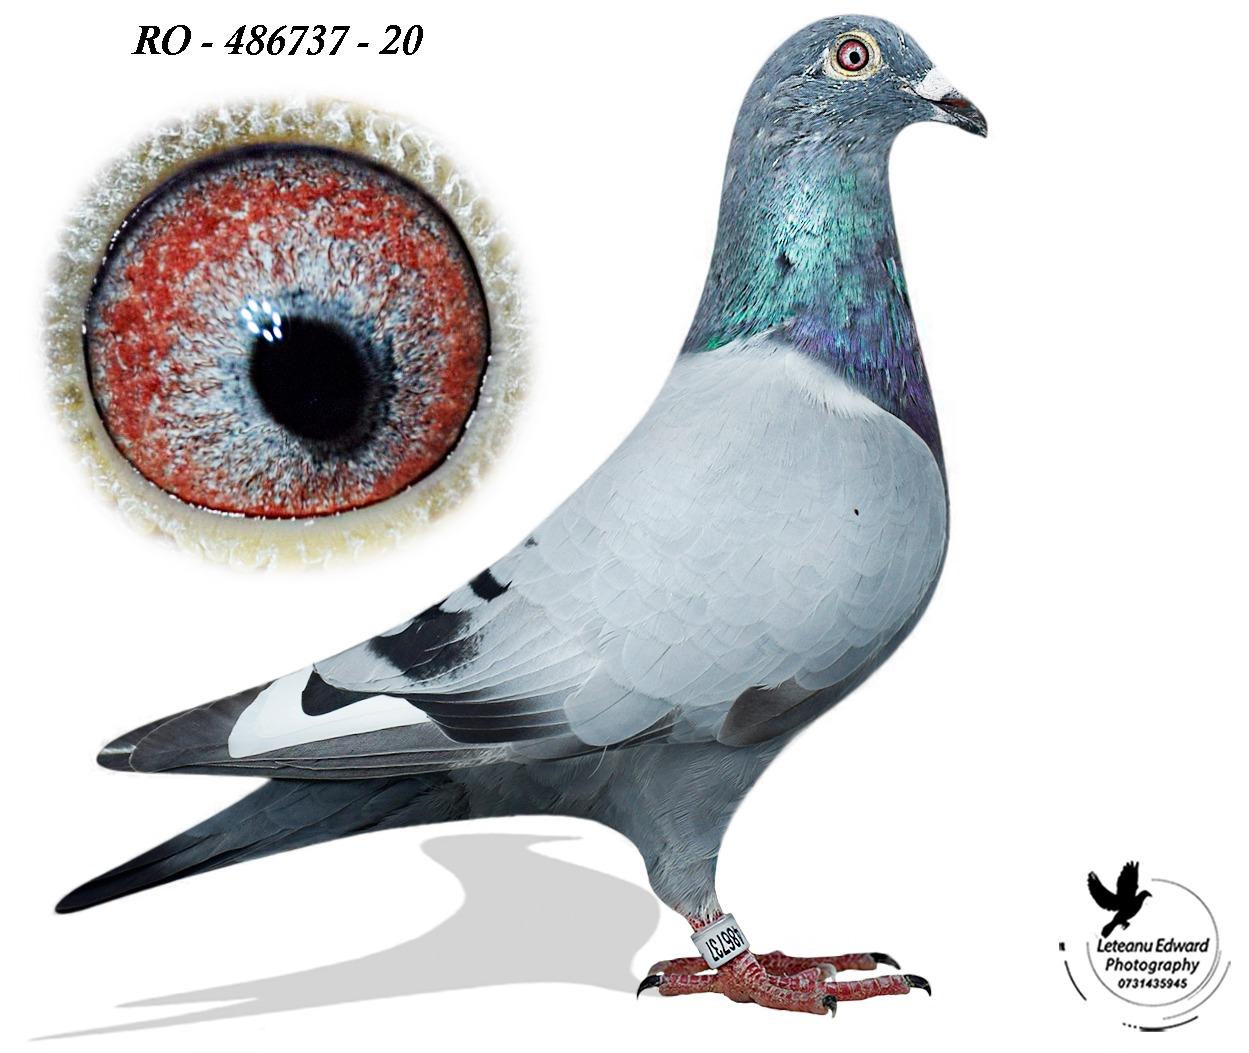 RO 20-486737